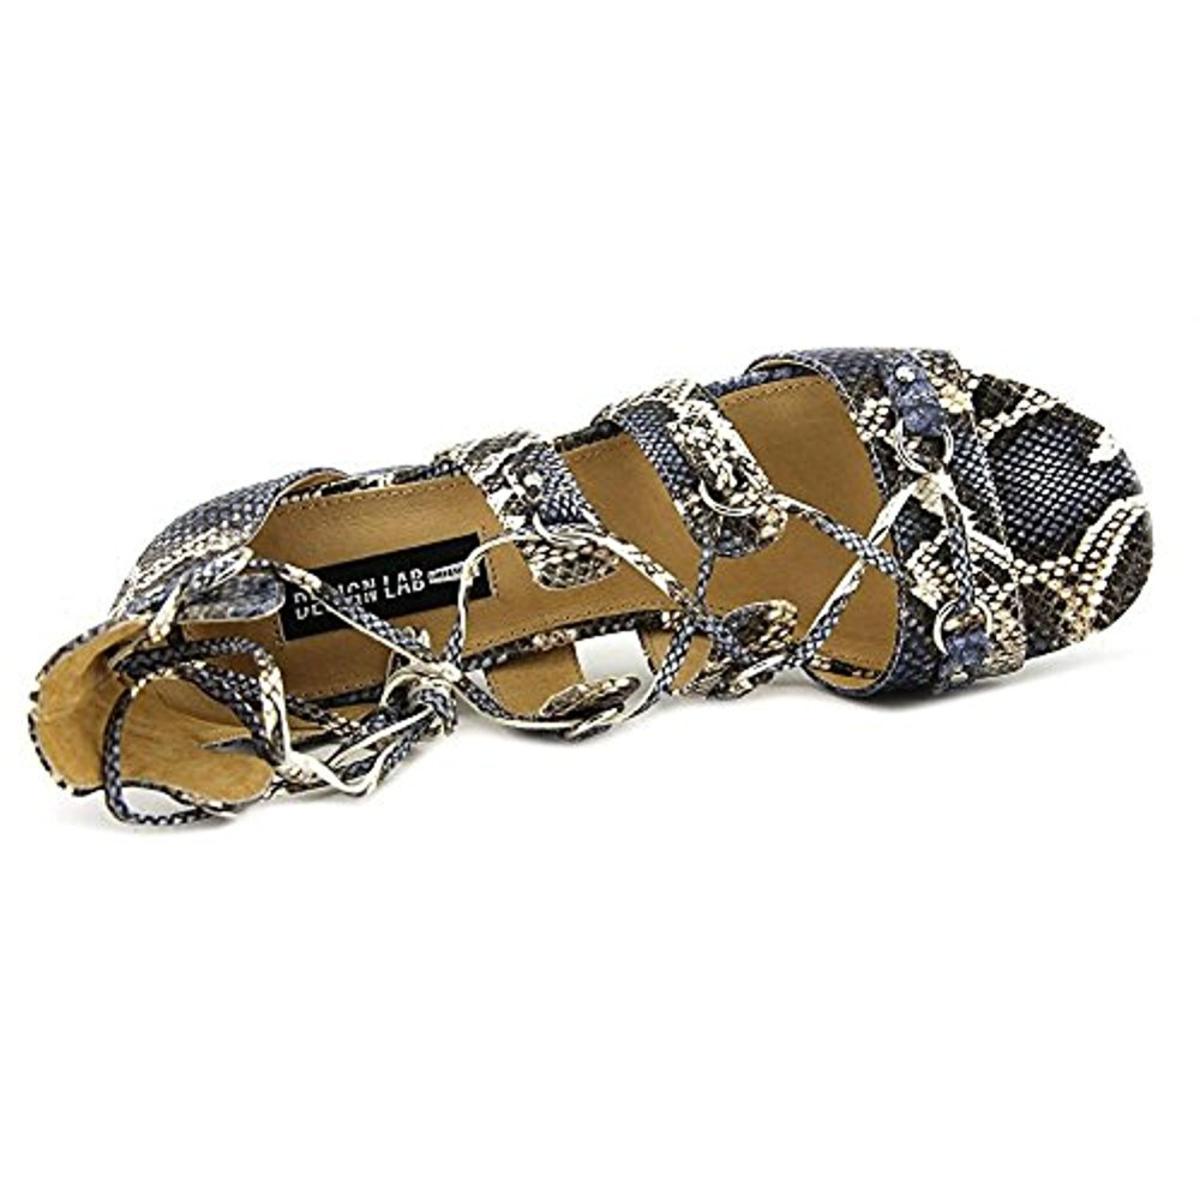 Design-Lab-Womens-Eldy-Block-Heel-Dress-Sandals-Shoes-BHFO-2676 thumbnail 15